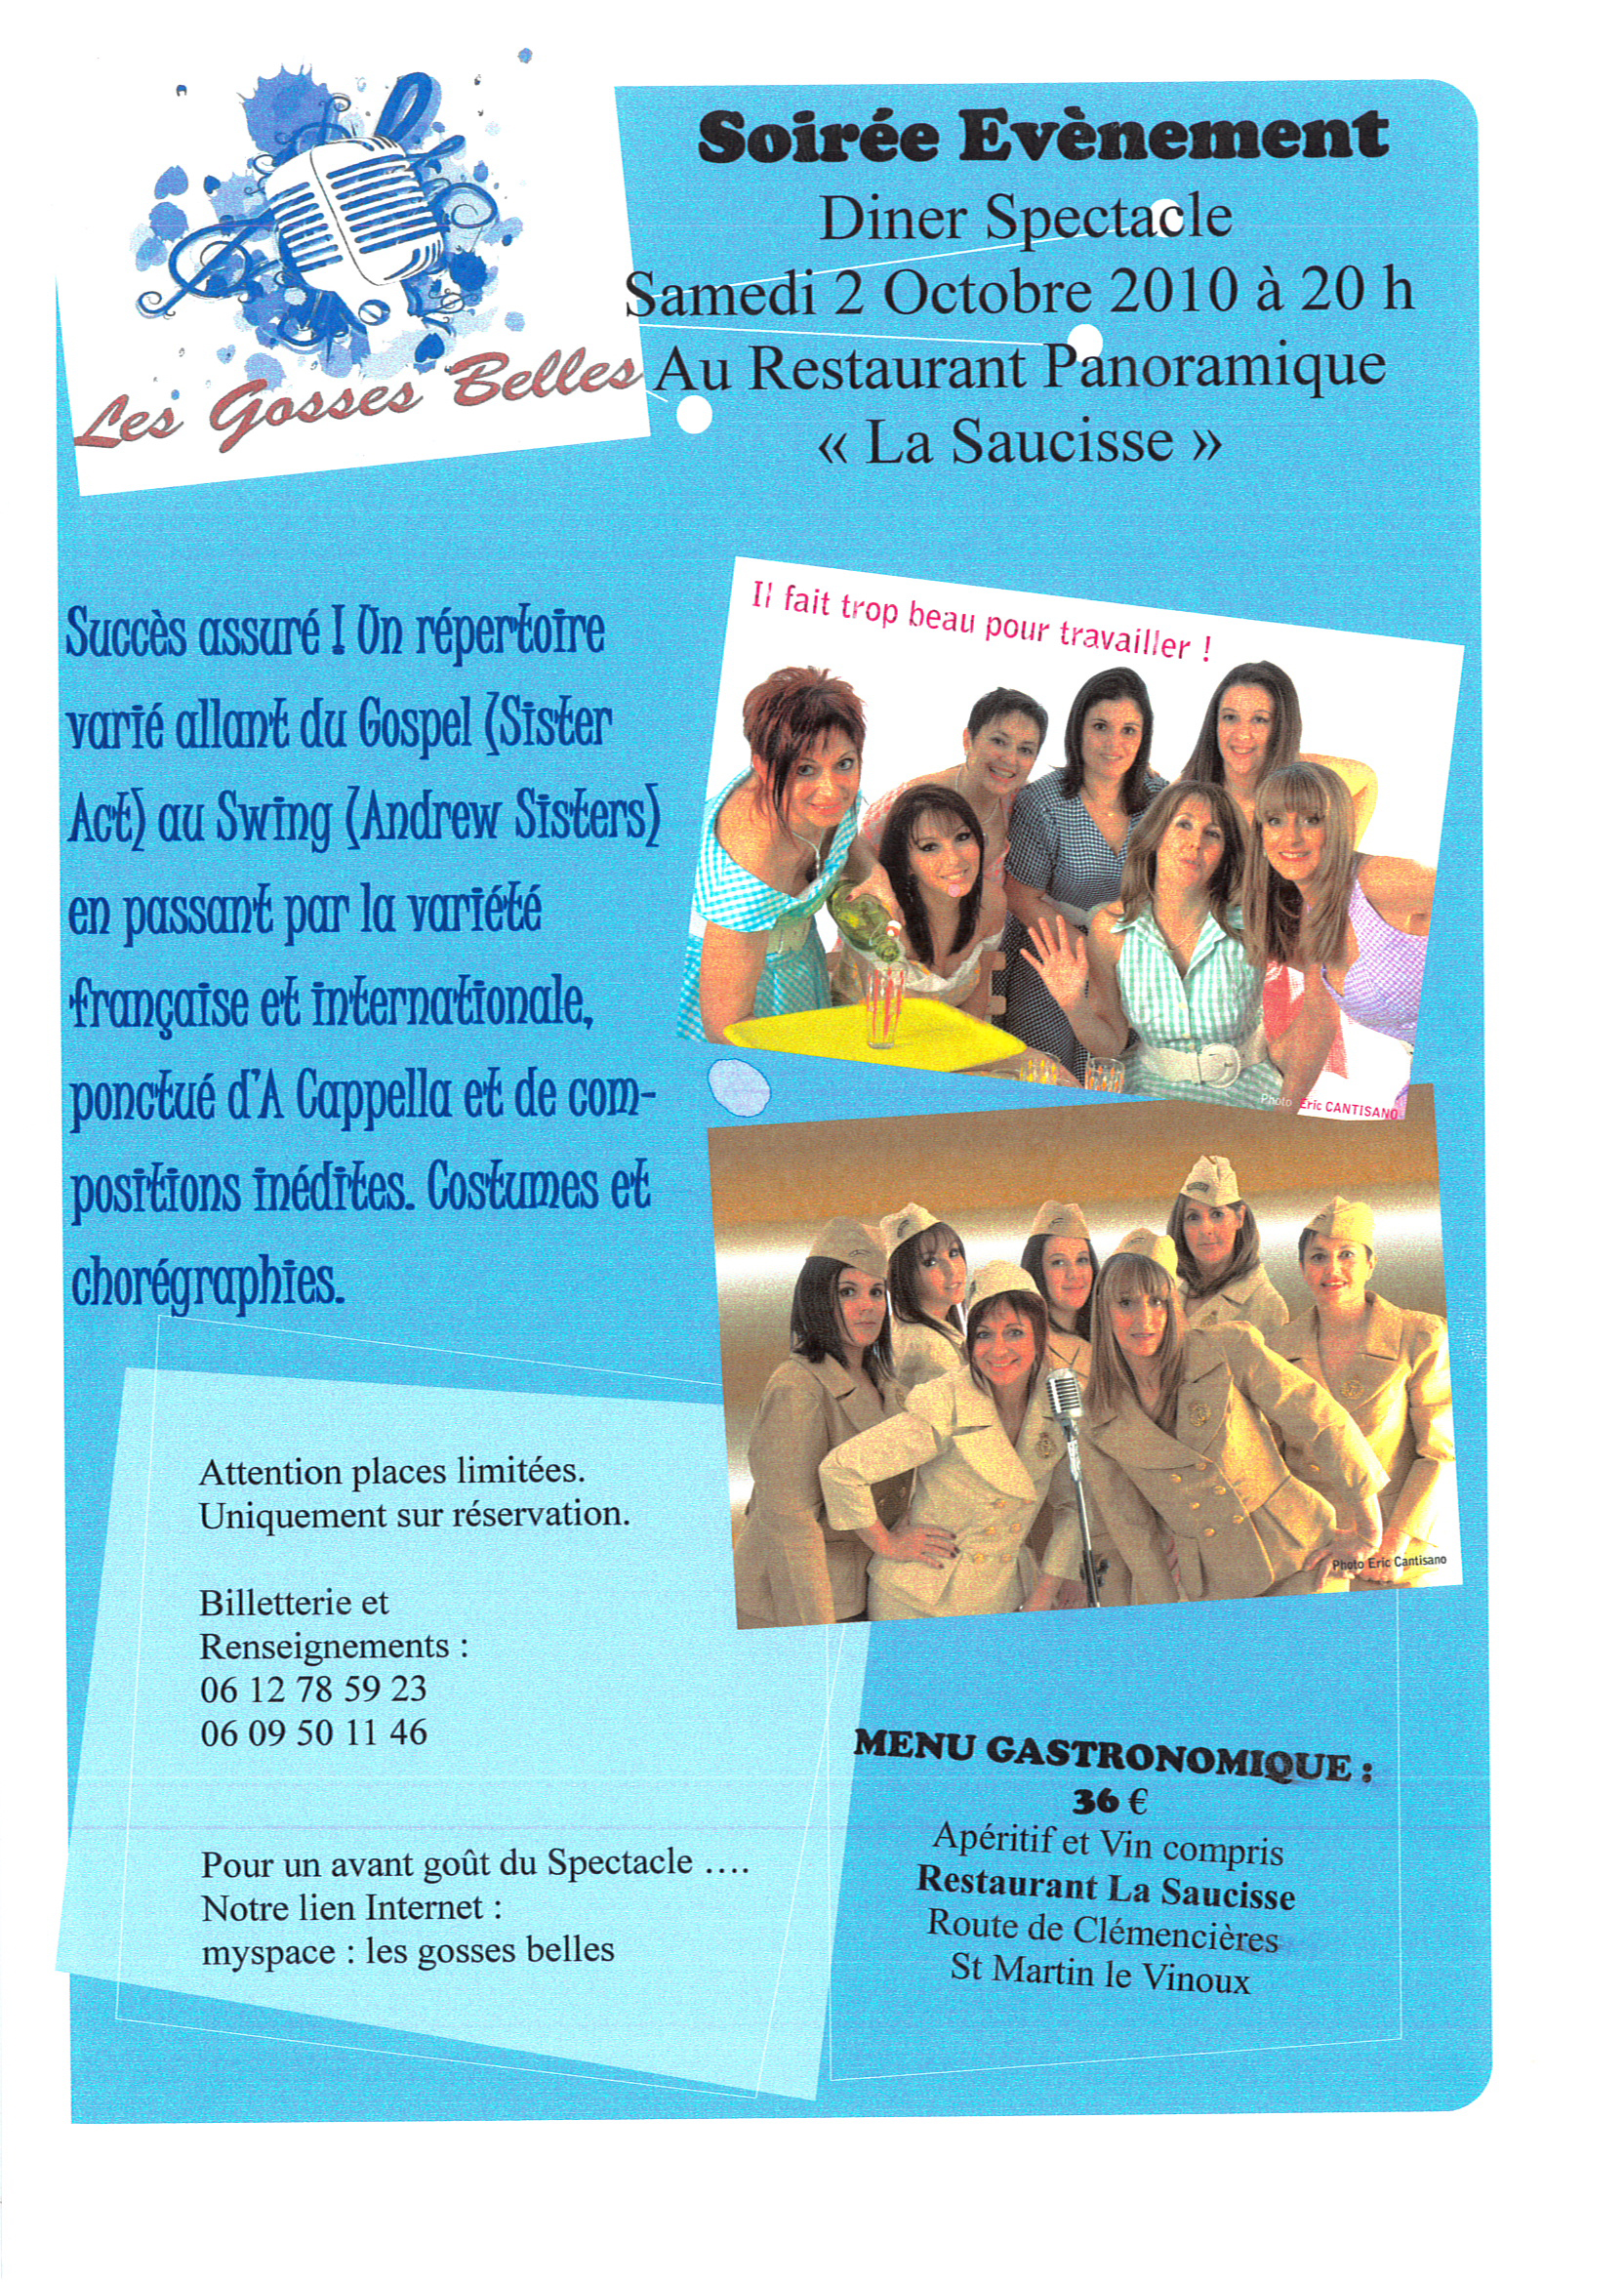 La Saucisse Restaurant